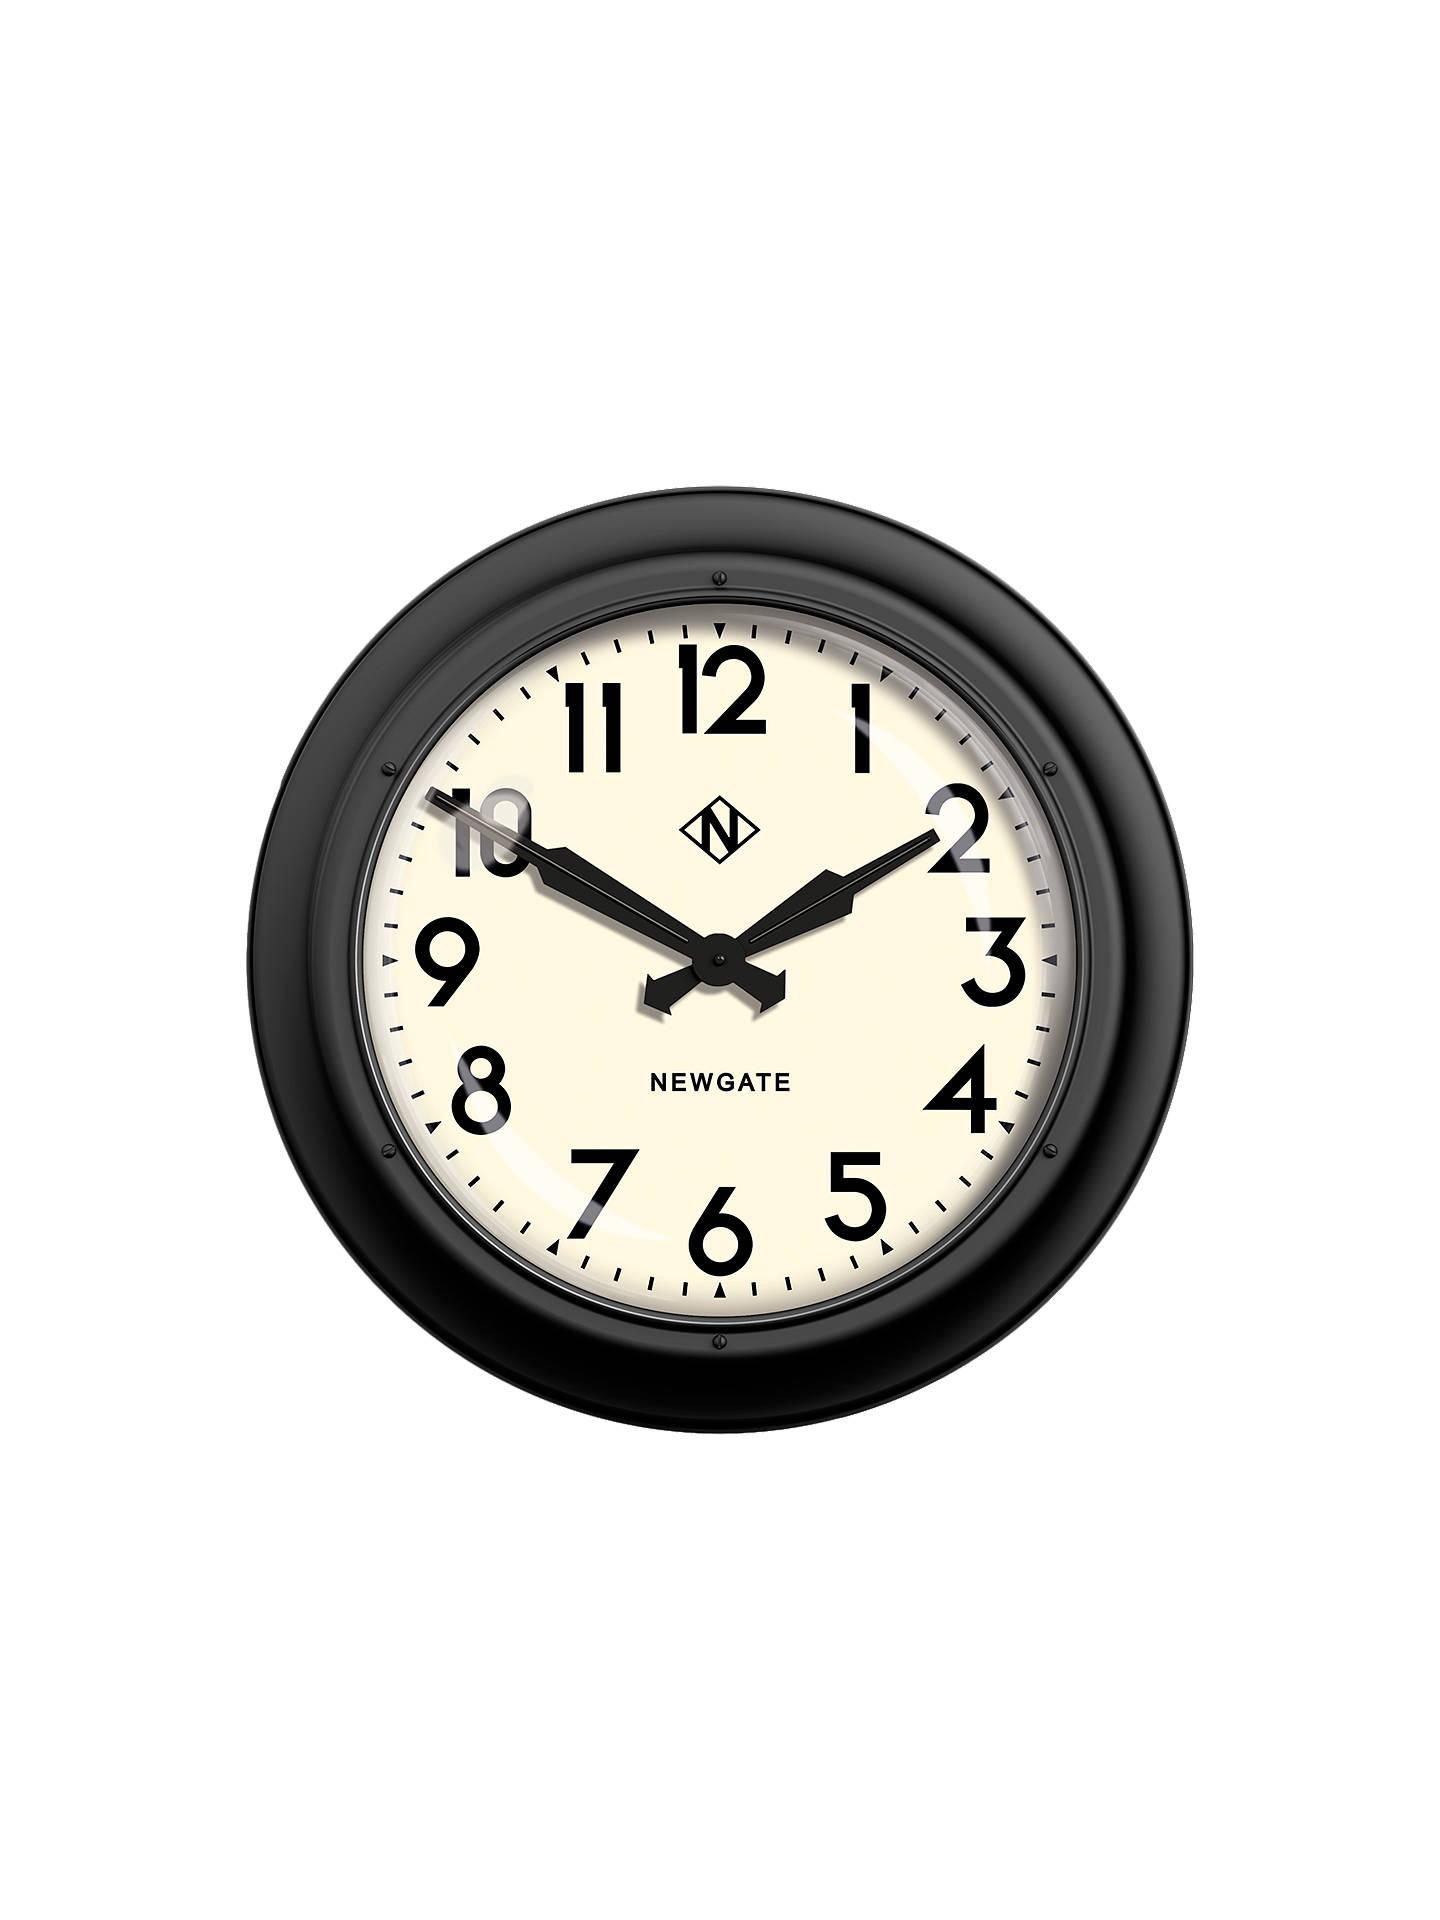 Newgate Giant Electric Wall Clock Dia 60cm Matte Black At